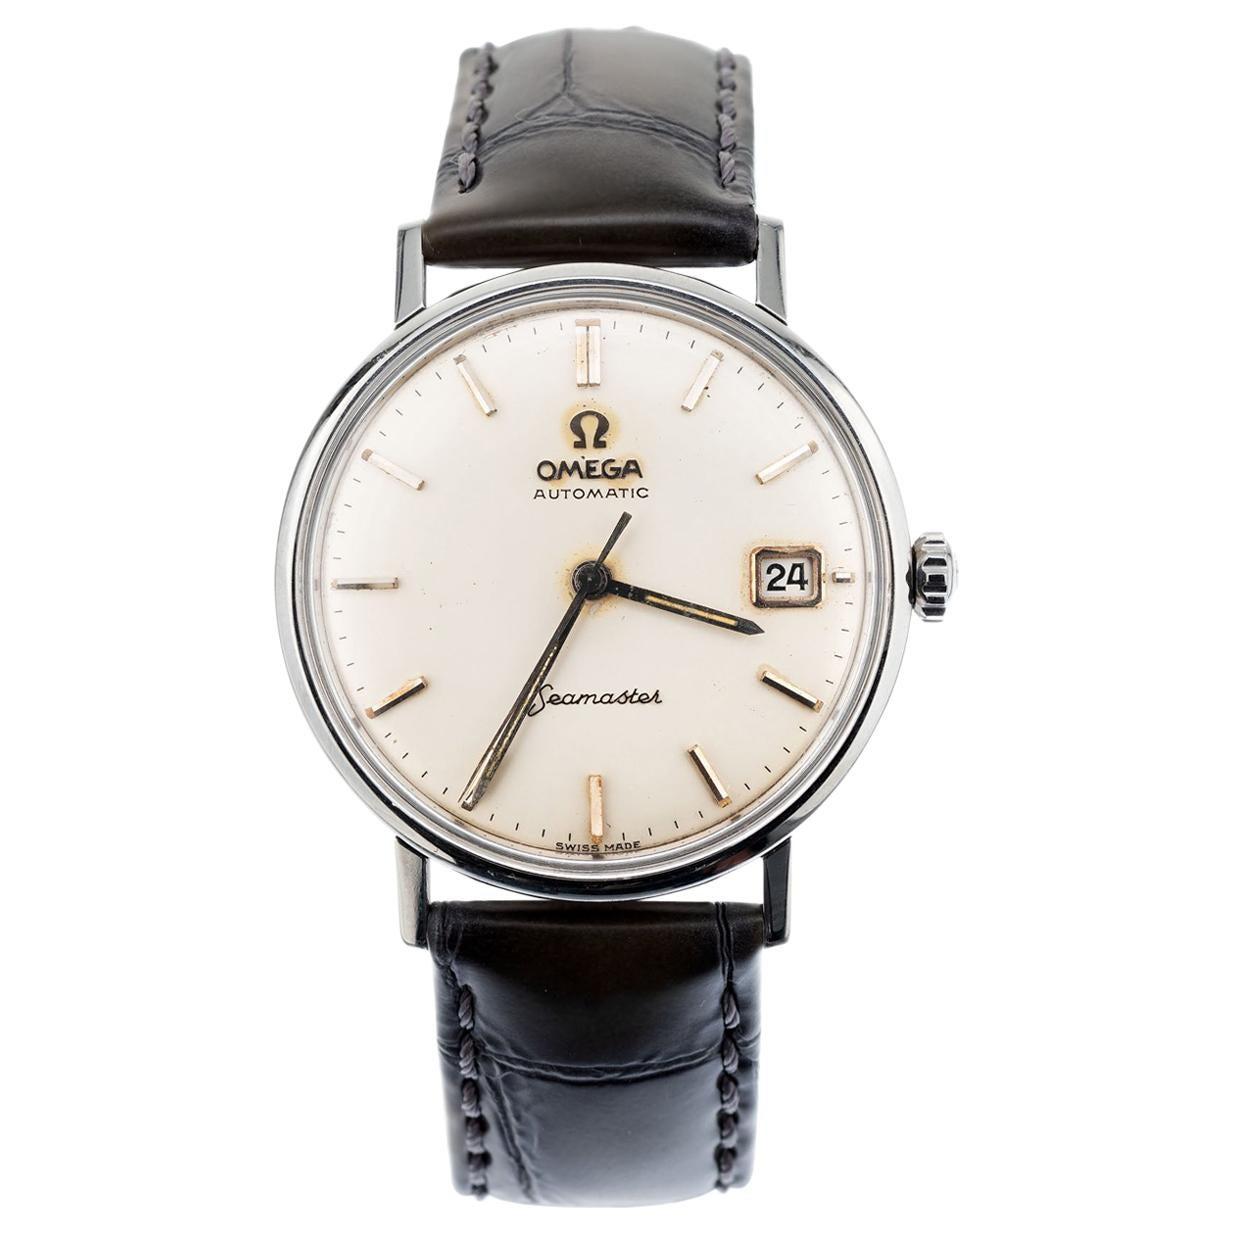 Omega Stainless Steel Seamaster Men's Wristwatch